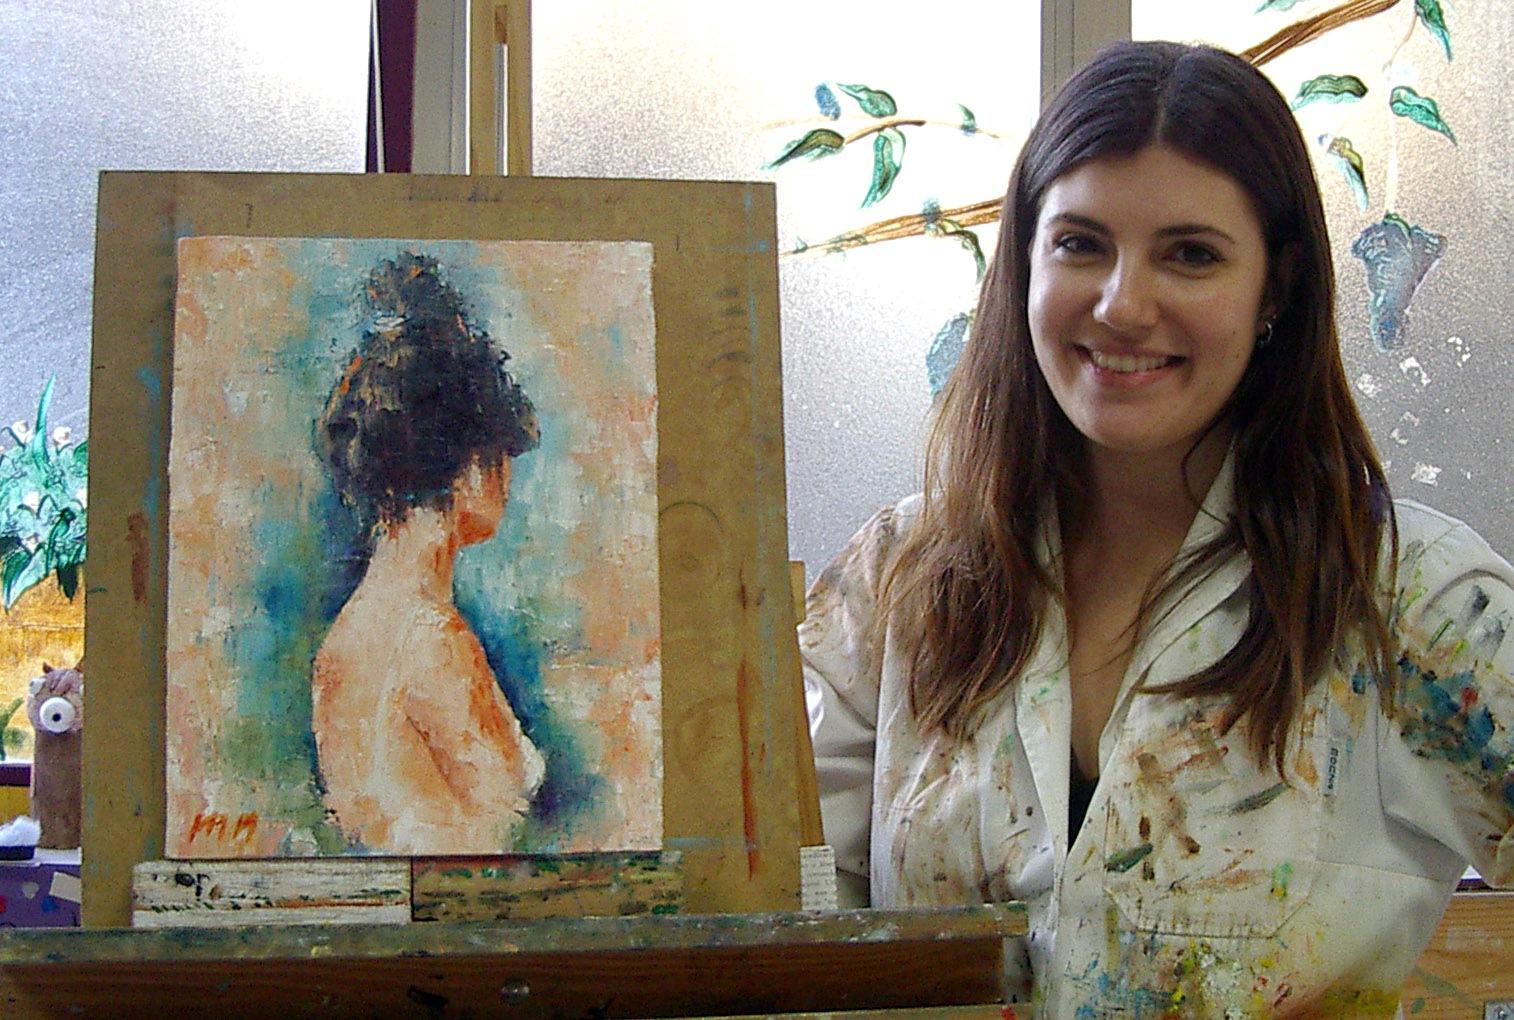 María, óleo sobre lienzo, curso 2015-2016